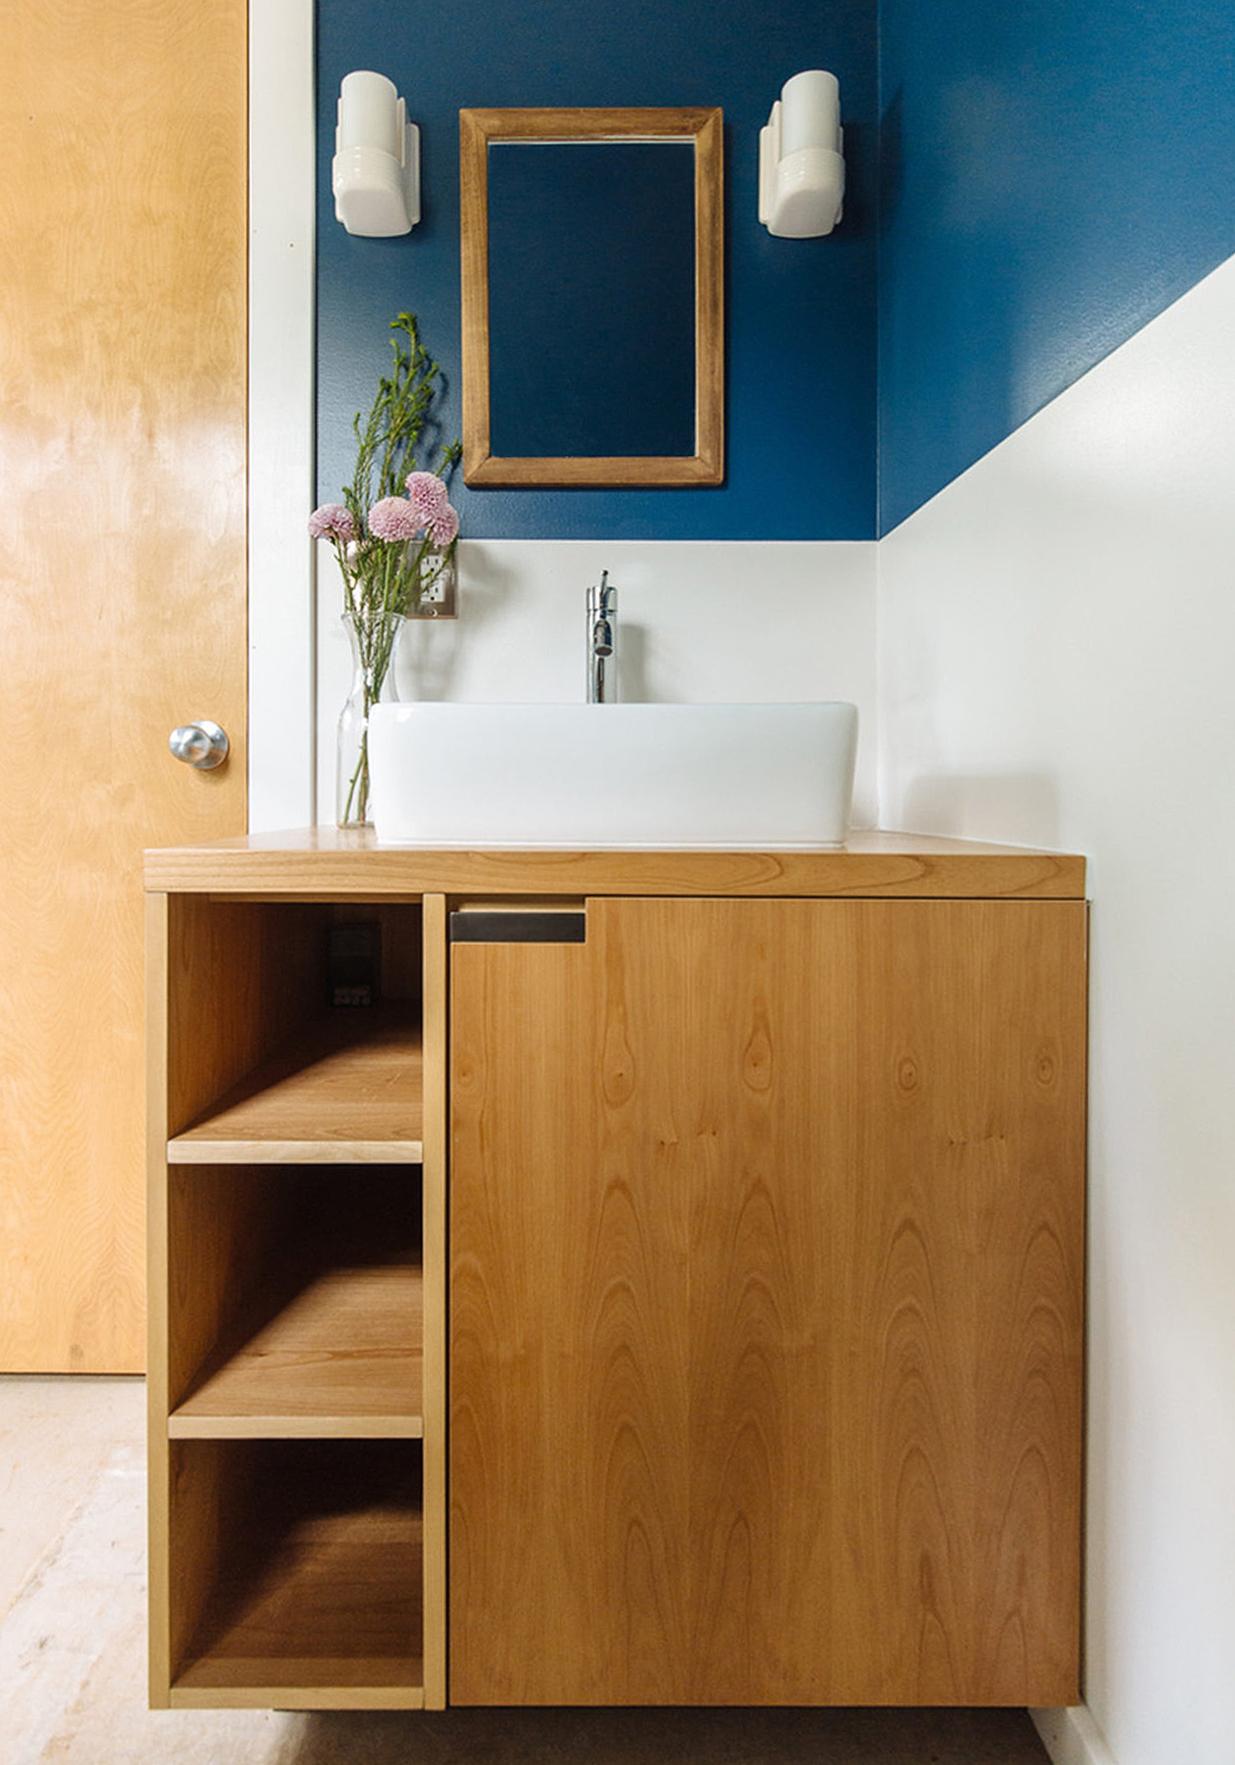 Print-Shop-Residence-05-1250x1785-B.jpg